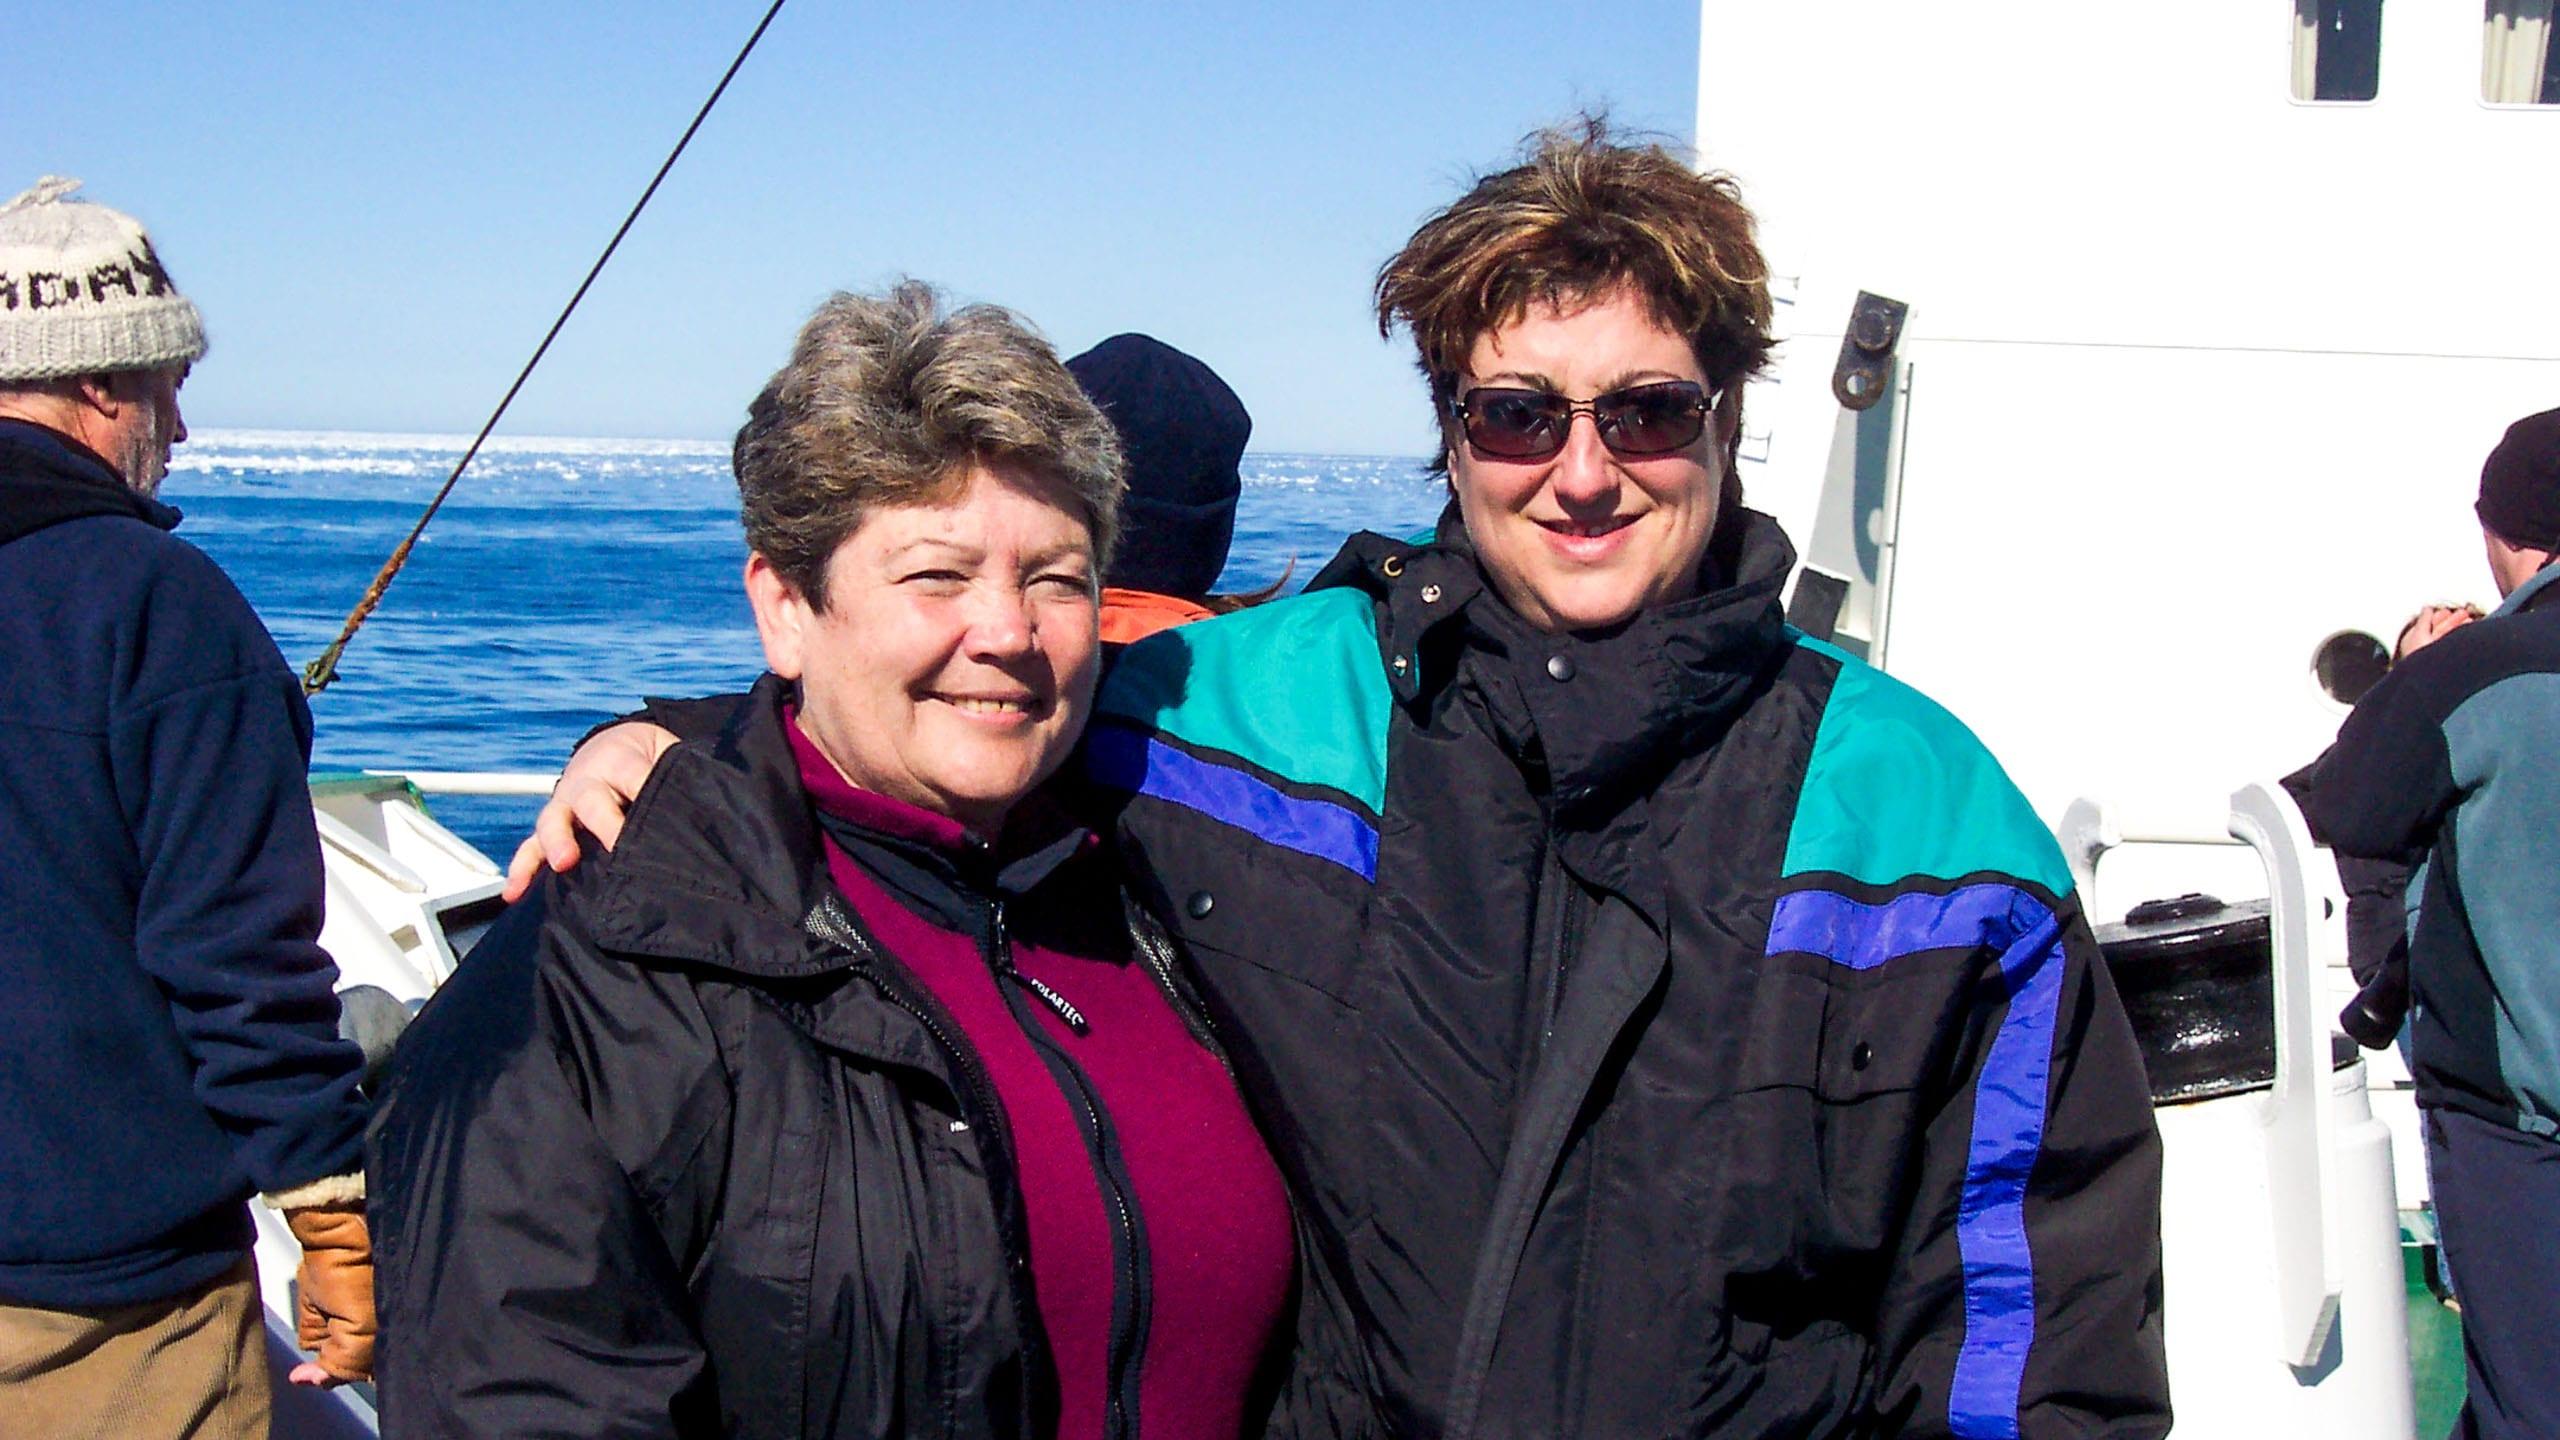 Women pose on ship during arctic trip